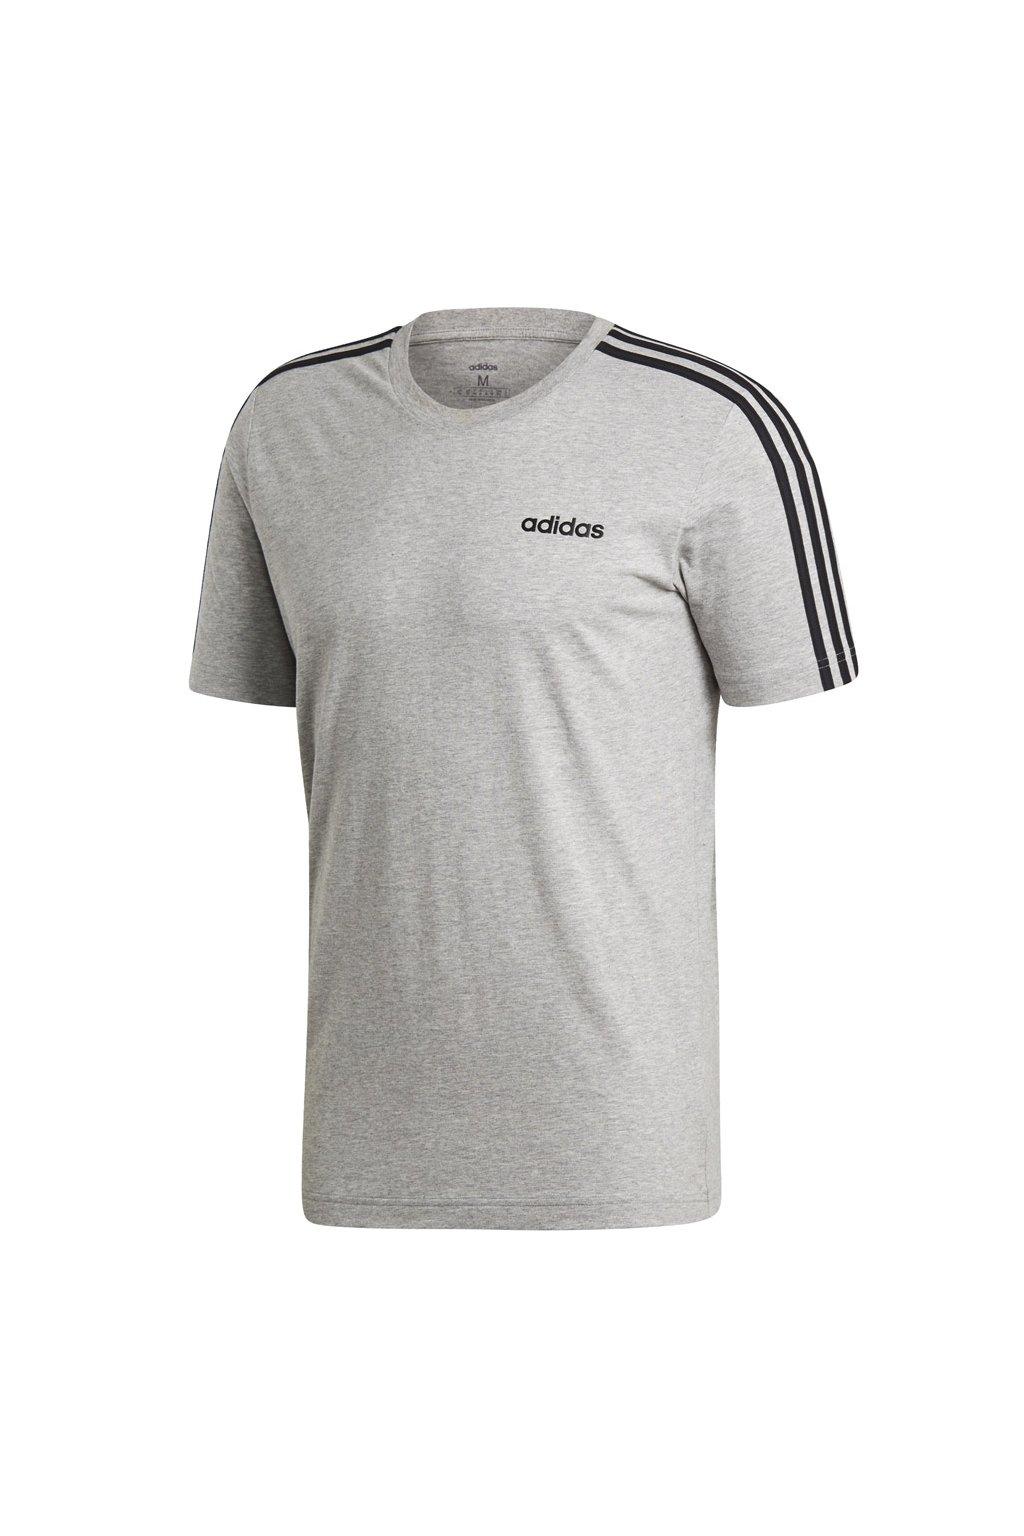 Pánske tričko Adidas Essentials 3 Stripes Tee grey DU0442